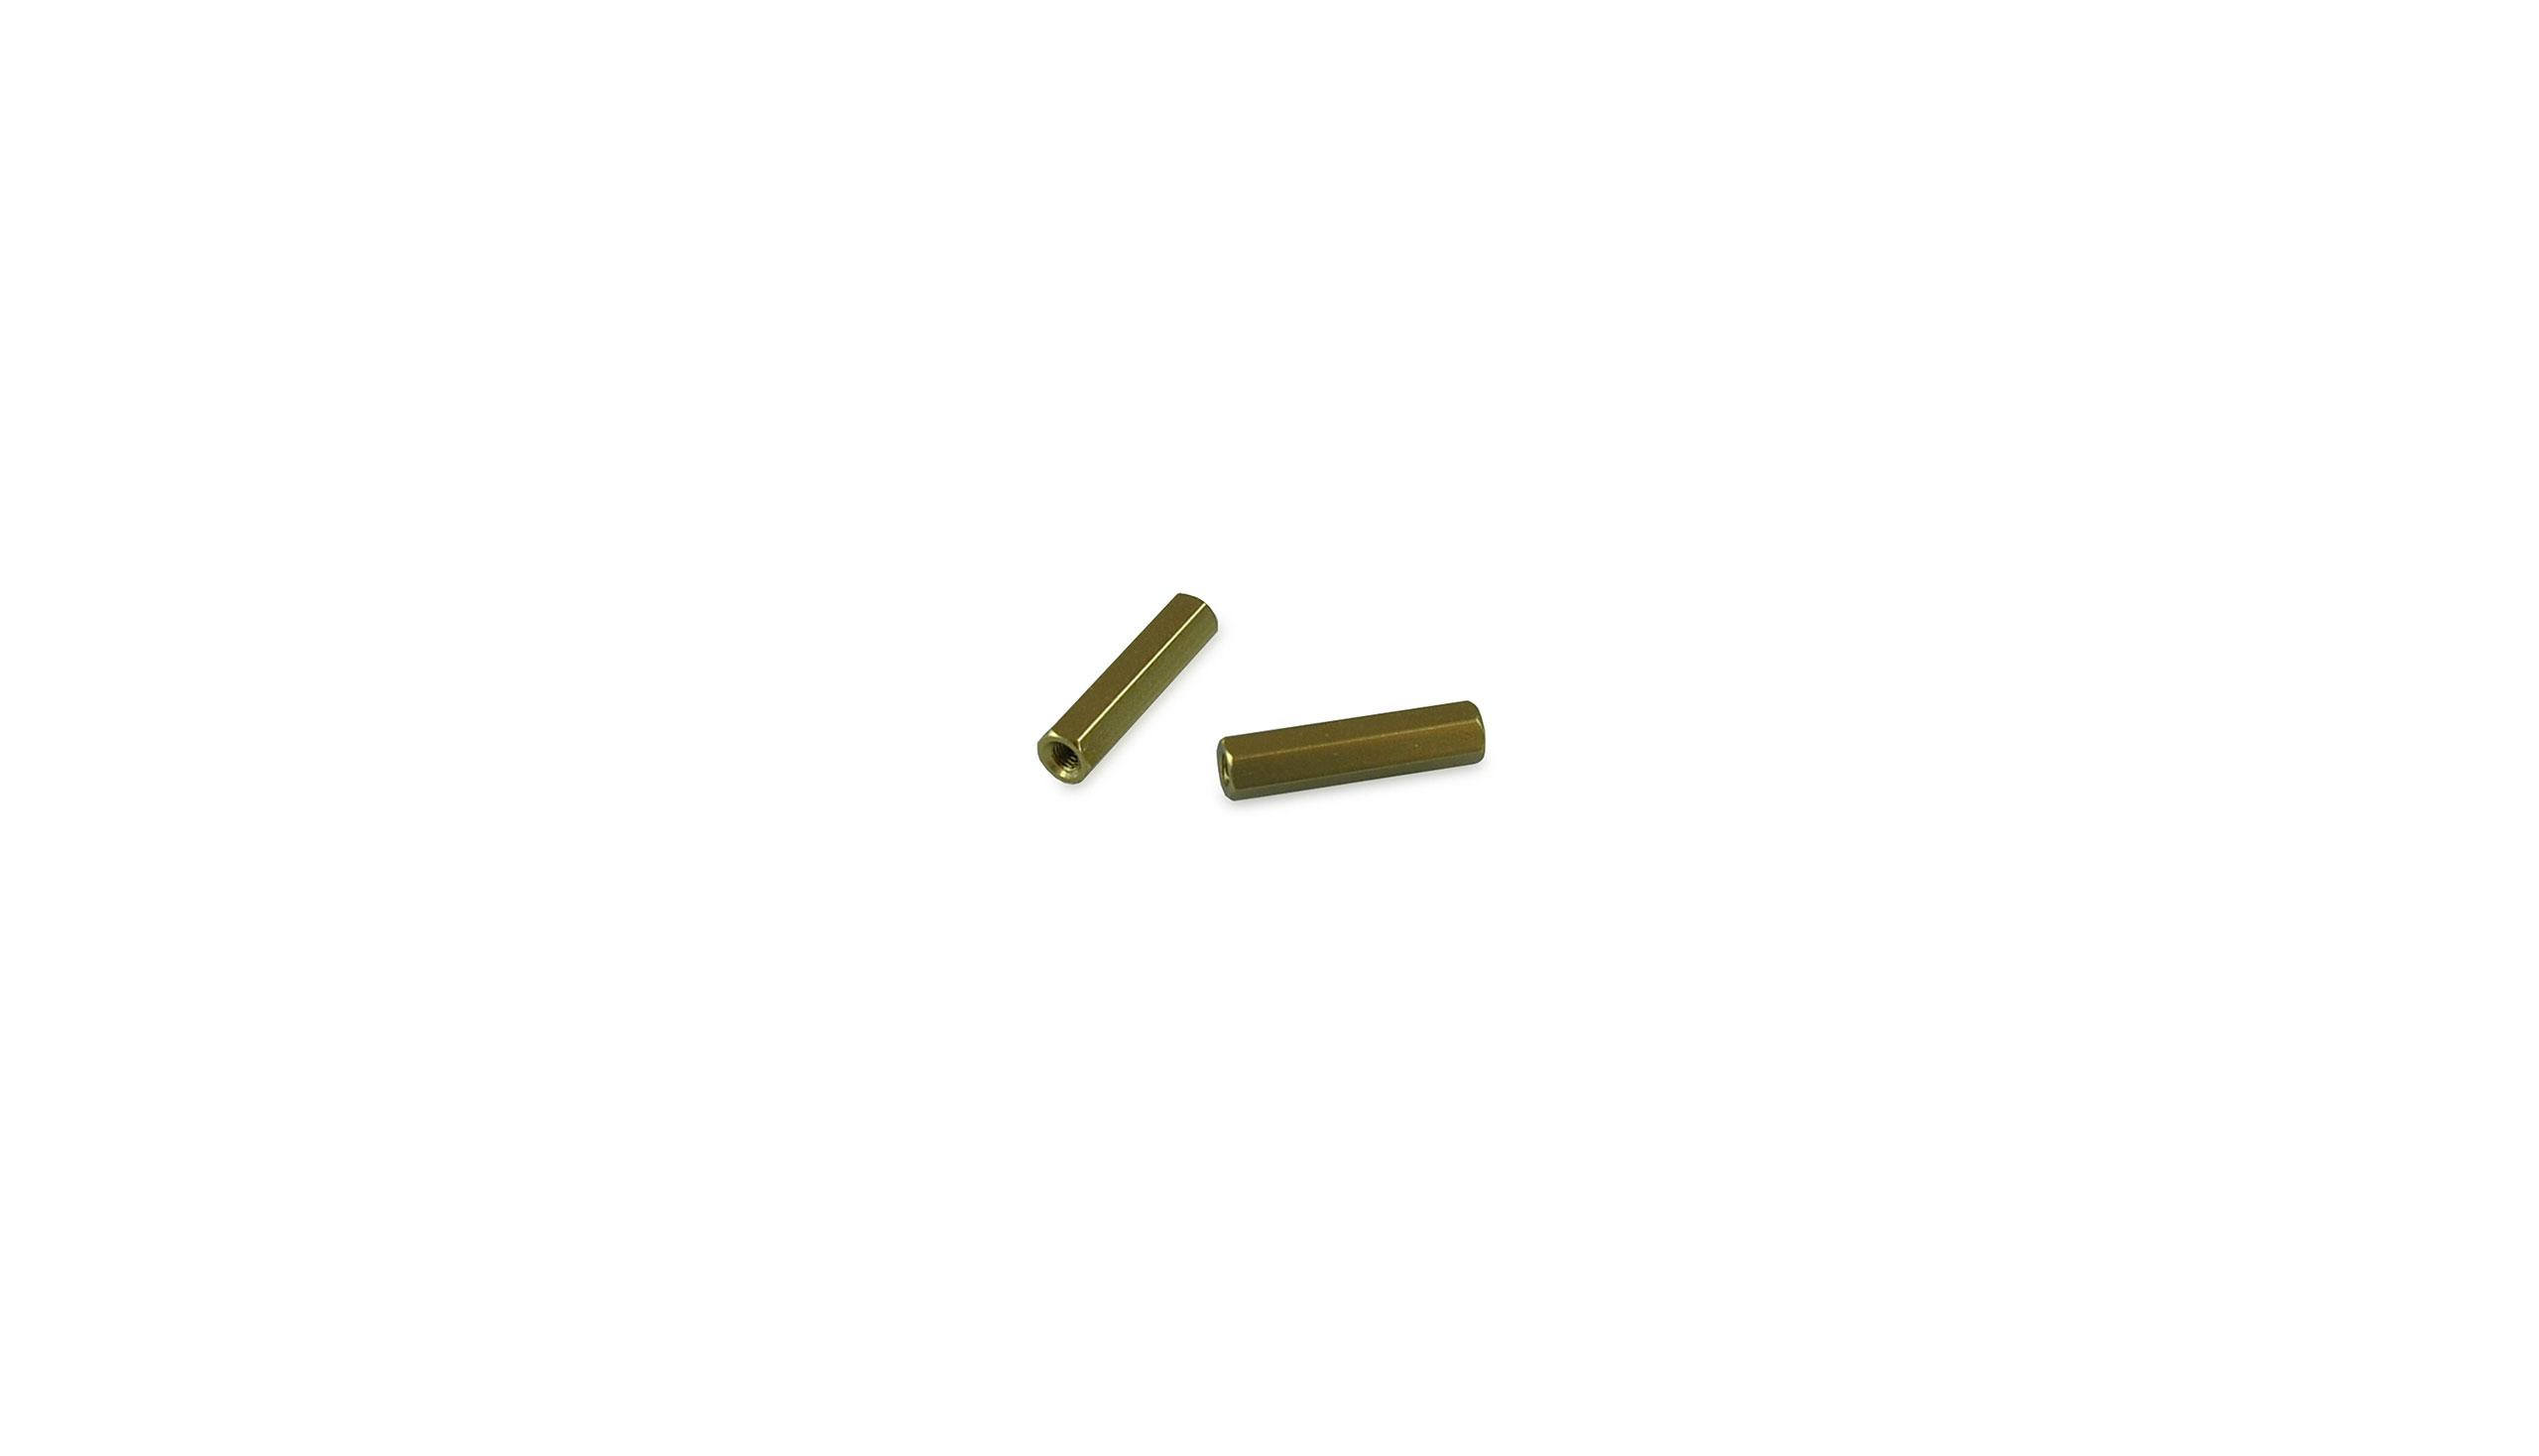 06005 Heckfluegel Versteifung Aluminium gun metal eloxiert